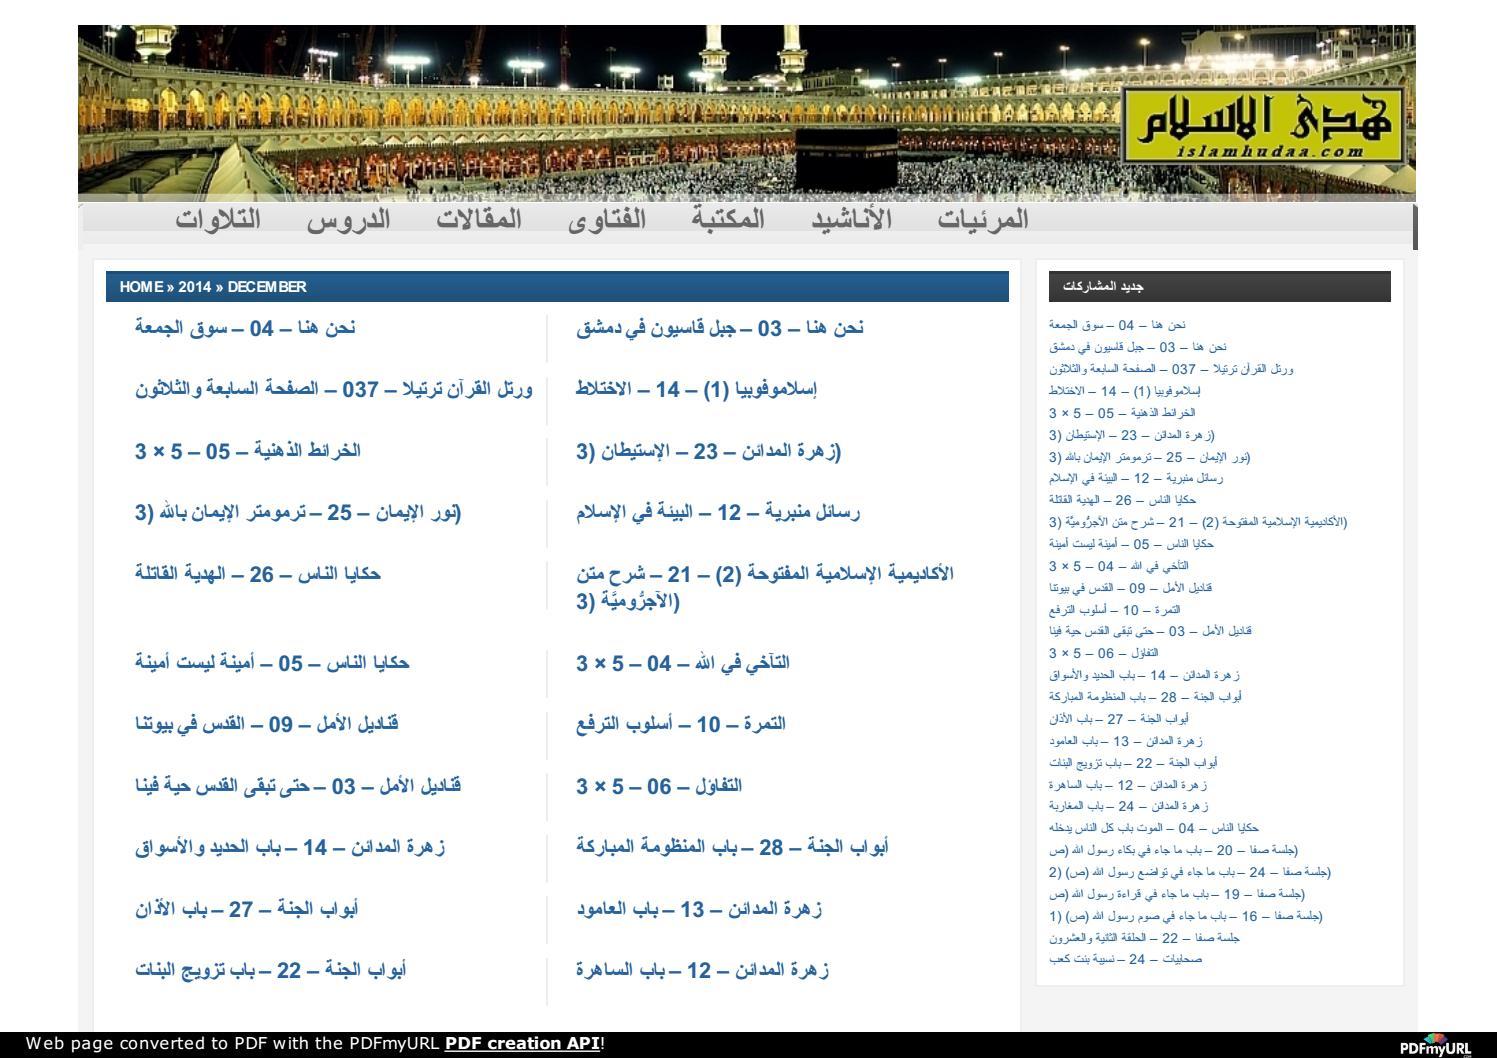 af61d4027123c Islamhudaa com i0 2014 12 by Islam Hudaa - issuu